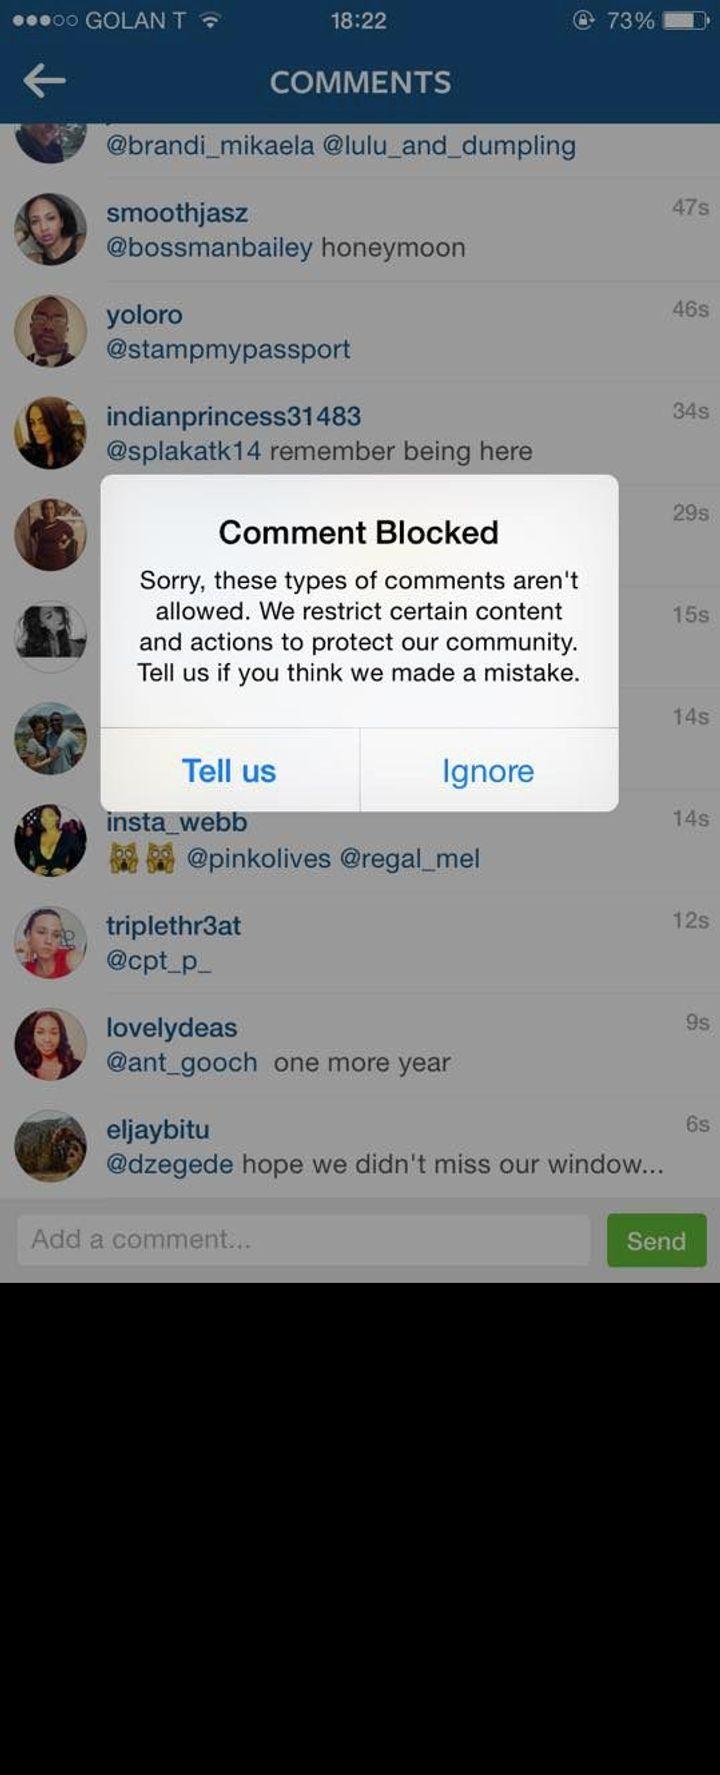 Did Instagram Block The Israeli Flag Emoji? – The Forward